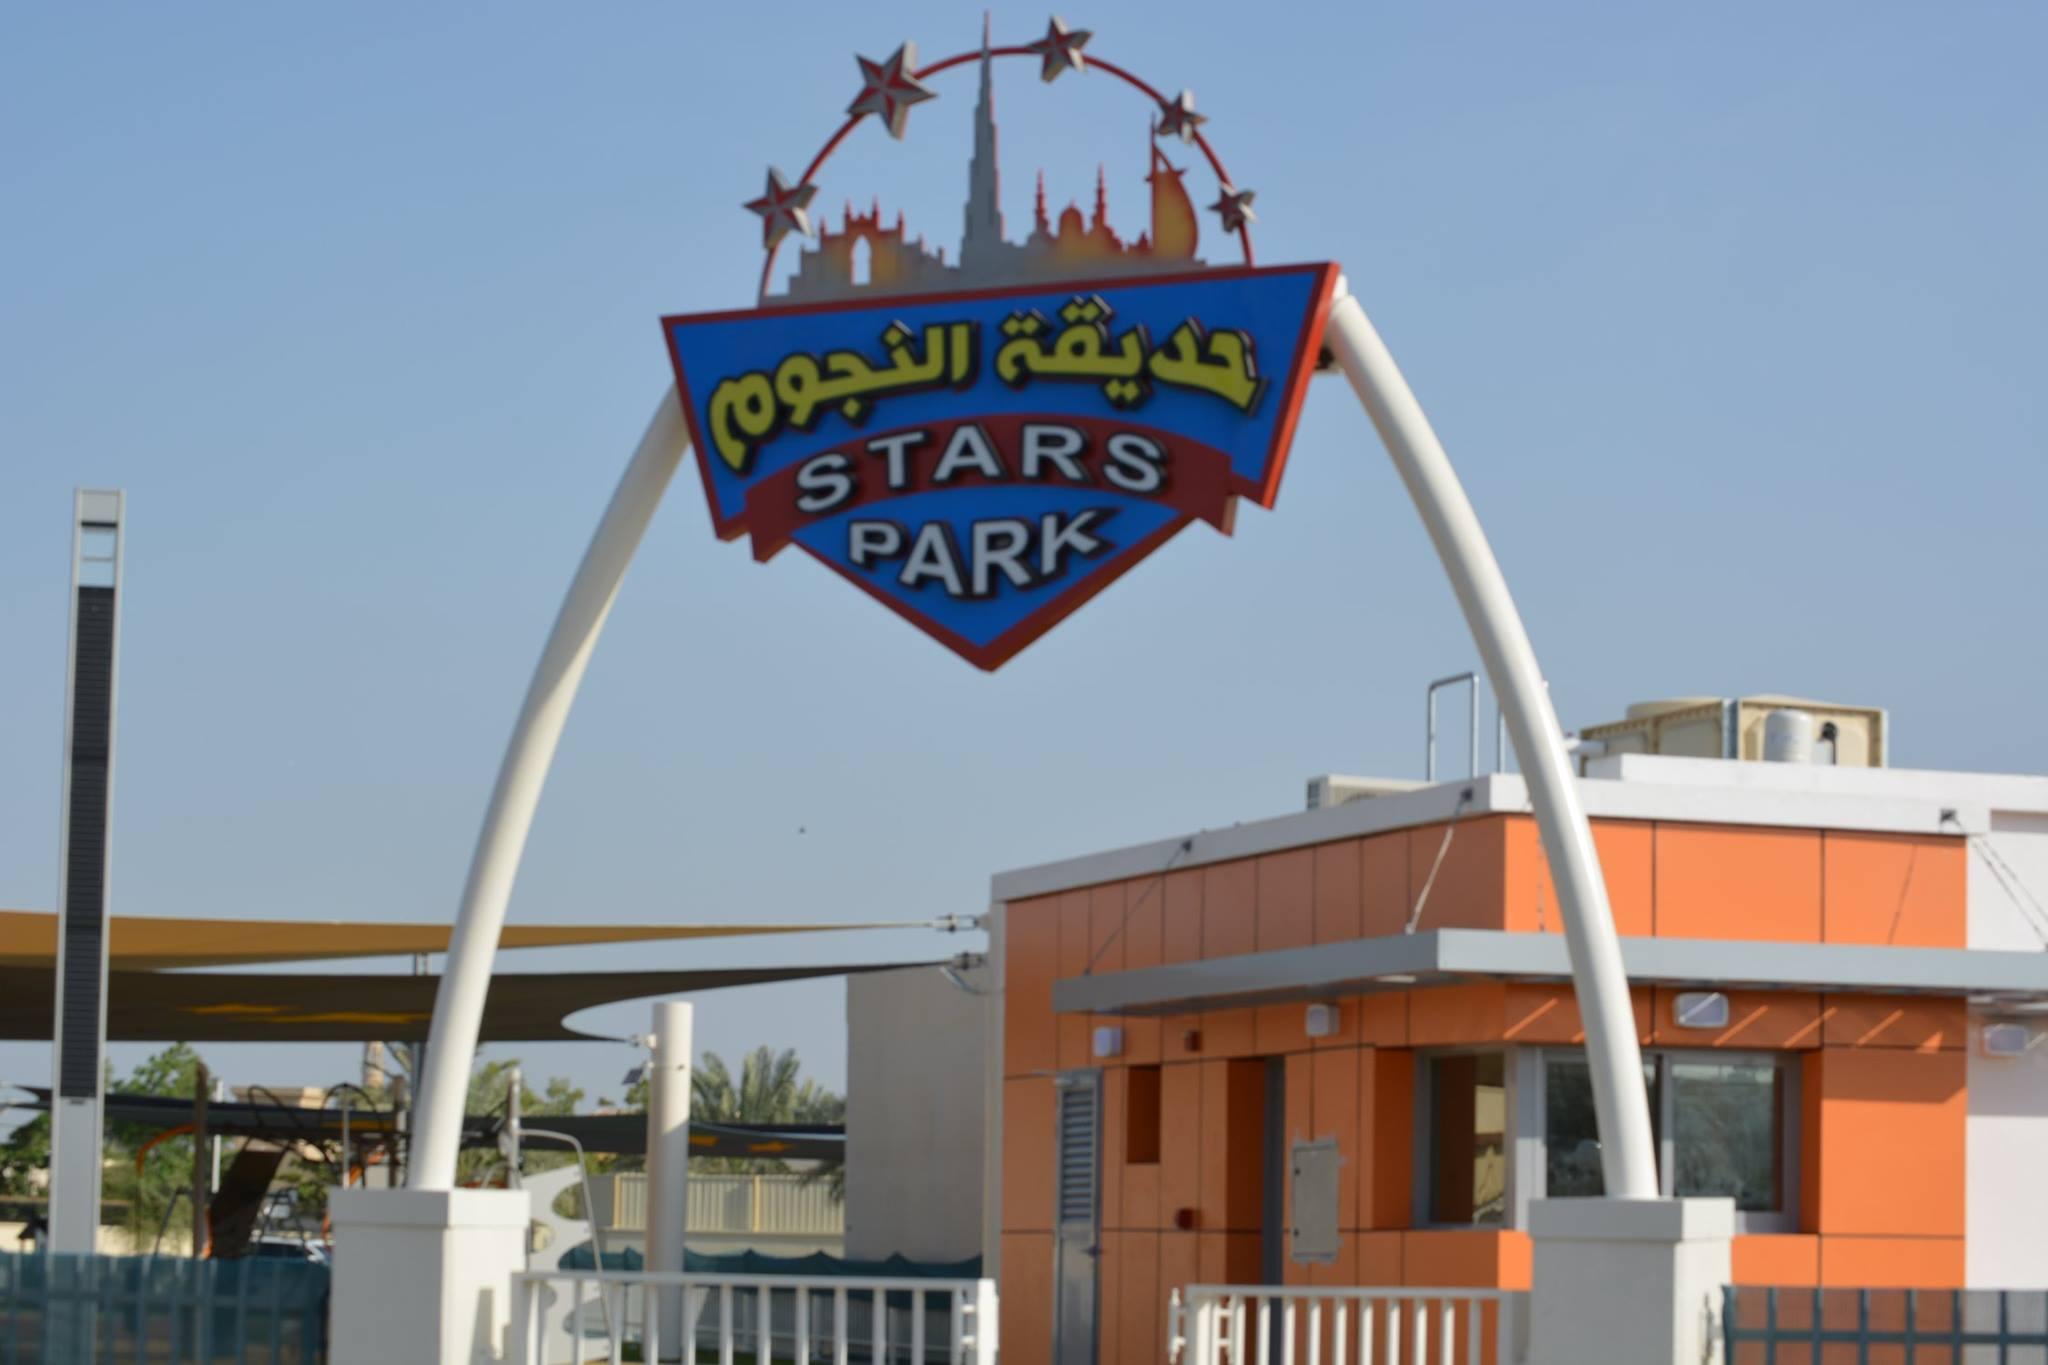 Stars Kids Park